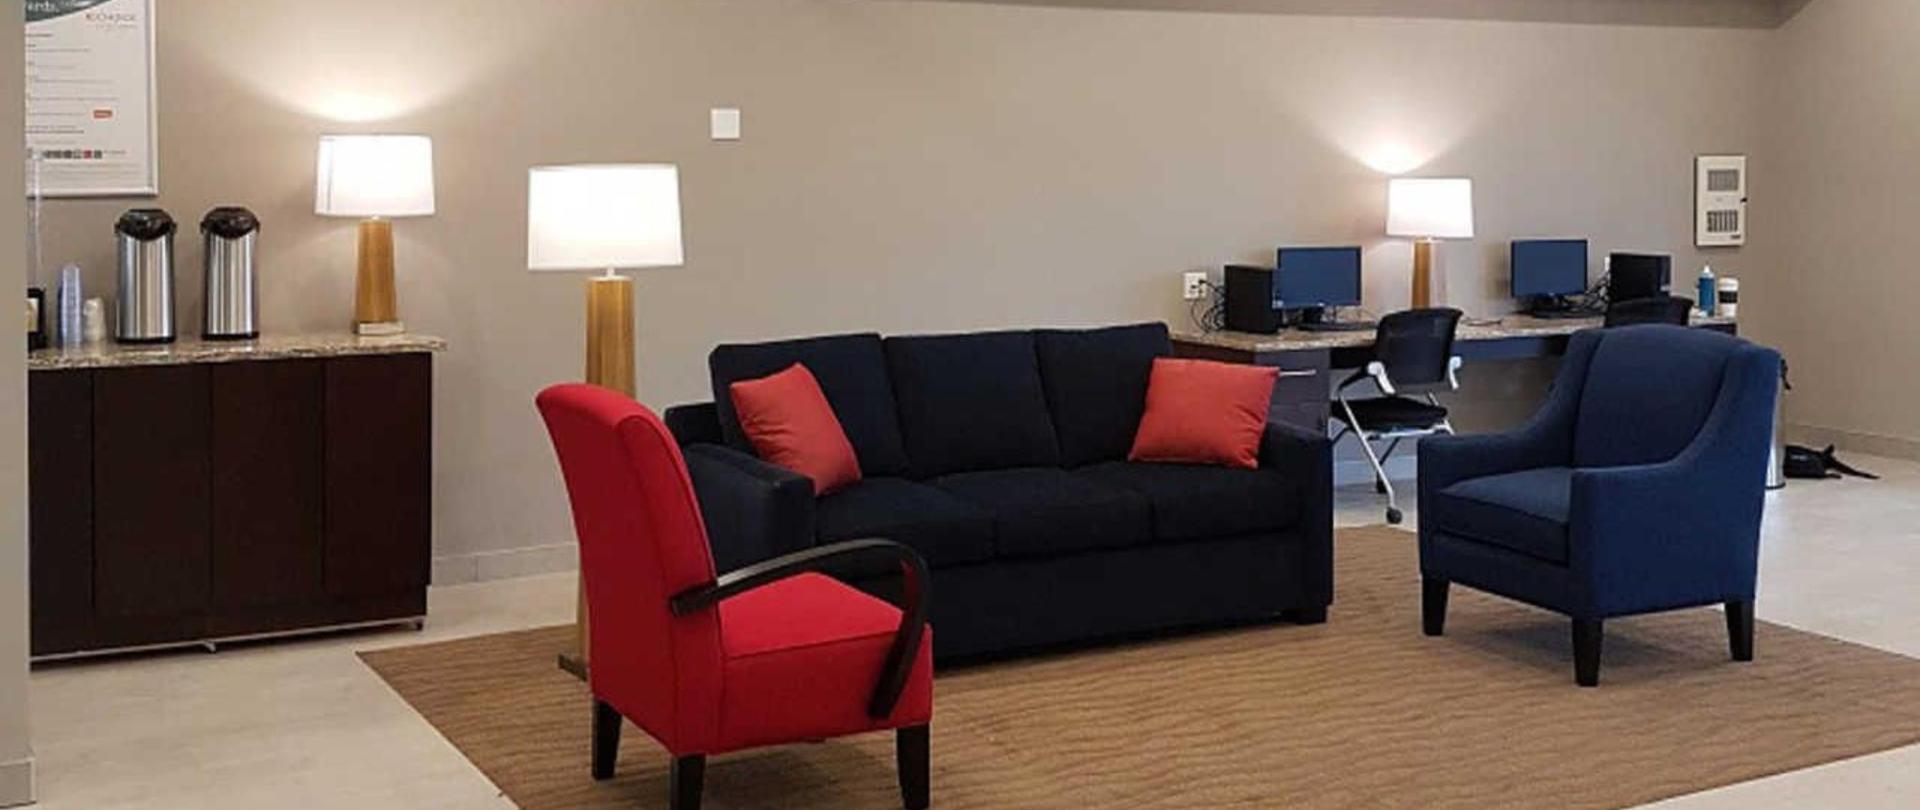 comfort-inn-suites-terrace-4.jpg